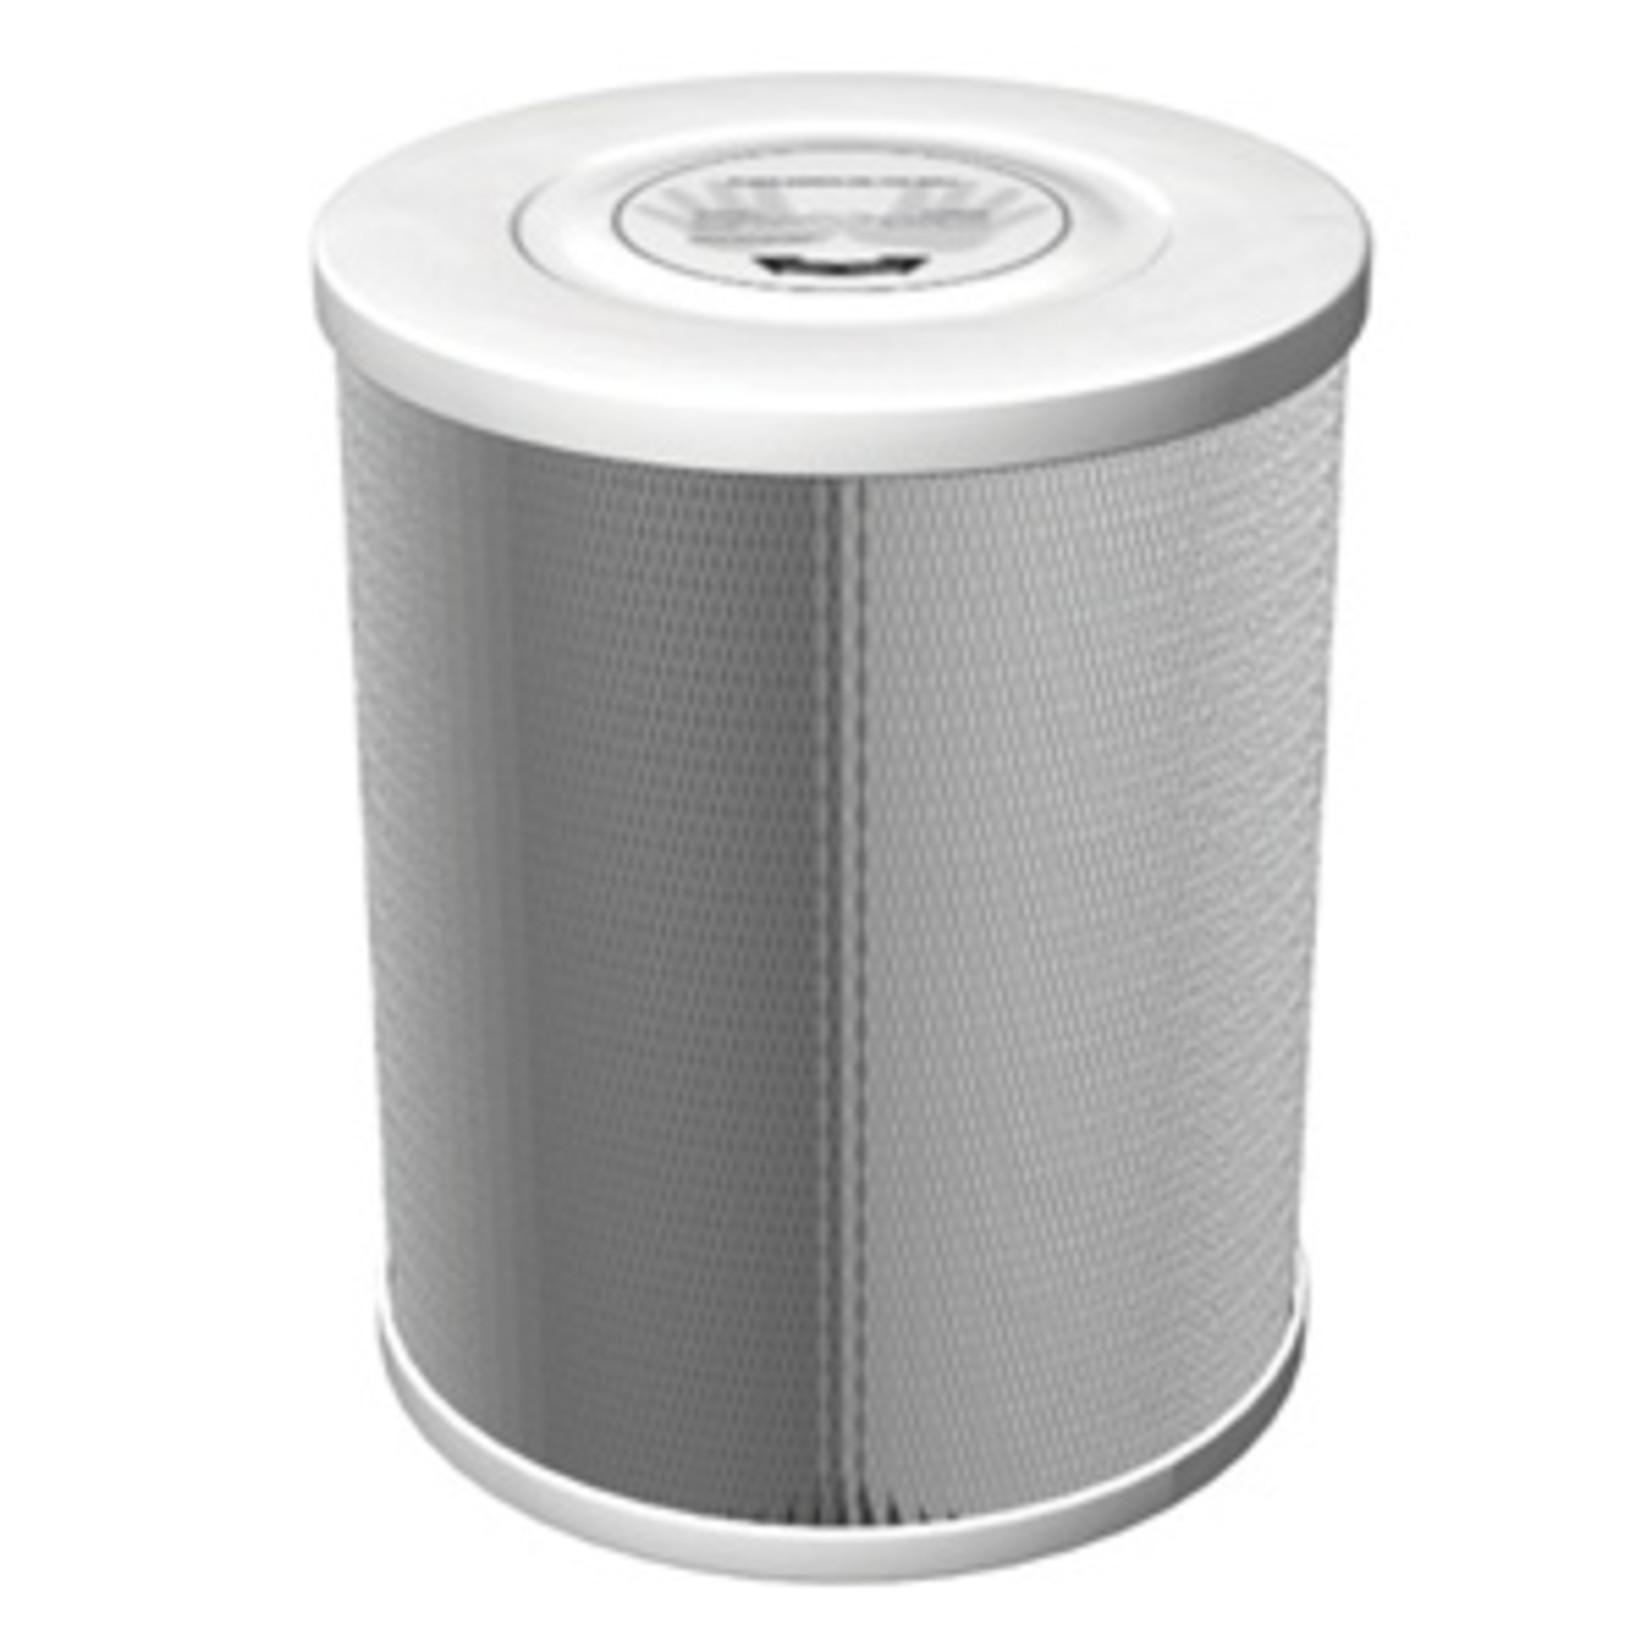 "Amaircare Amaircare 16"" Easy Twist HEPA Filter Cartridge"